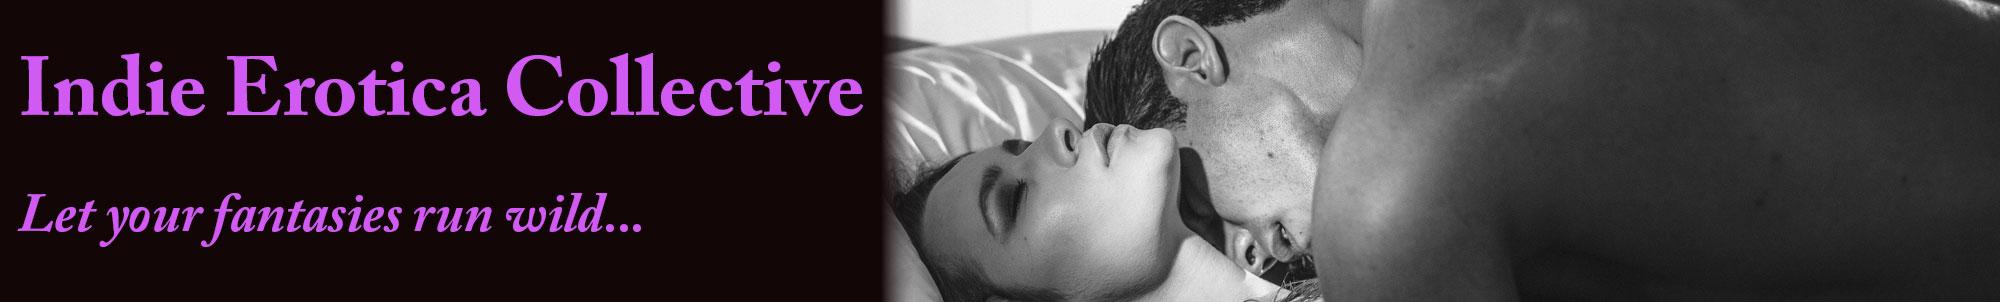 Indie Erotica Collective